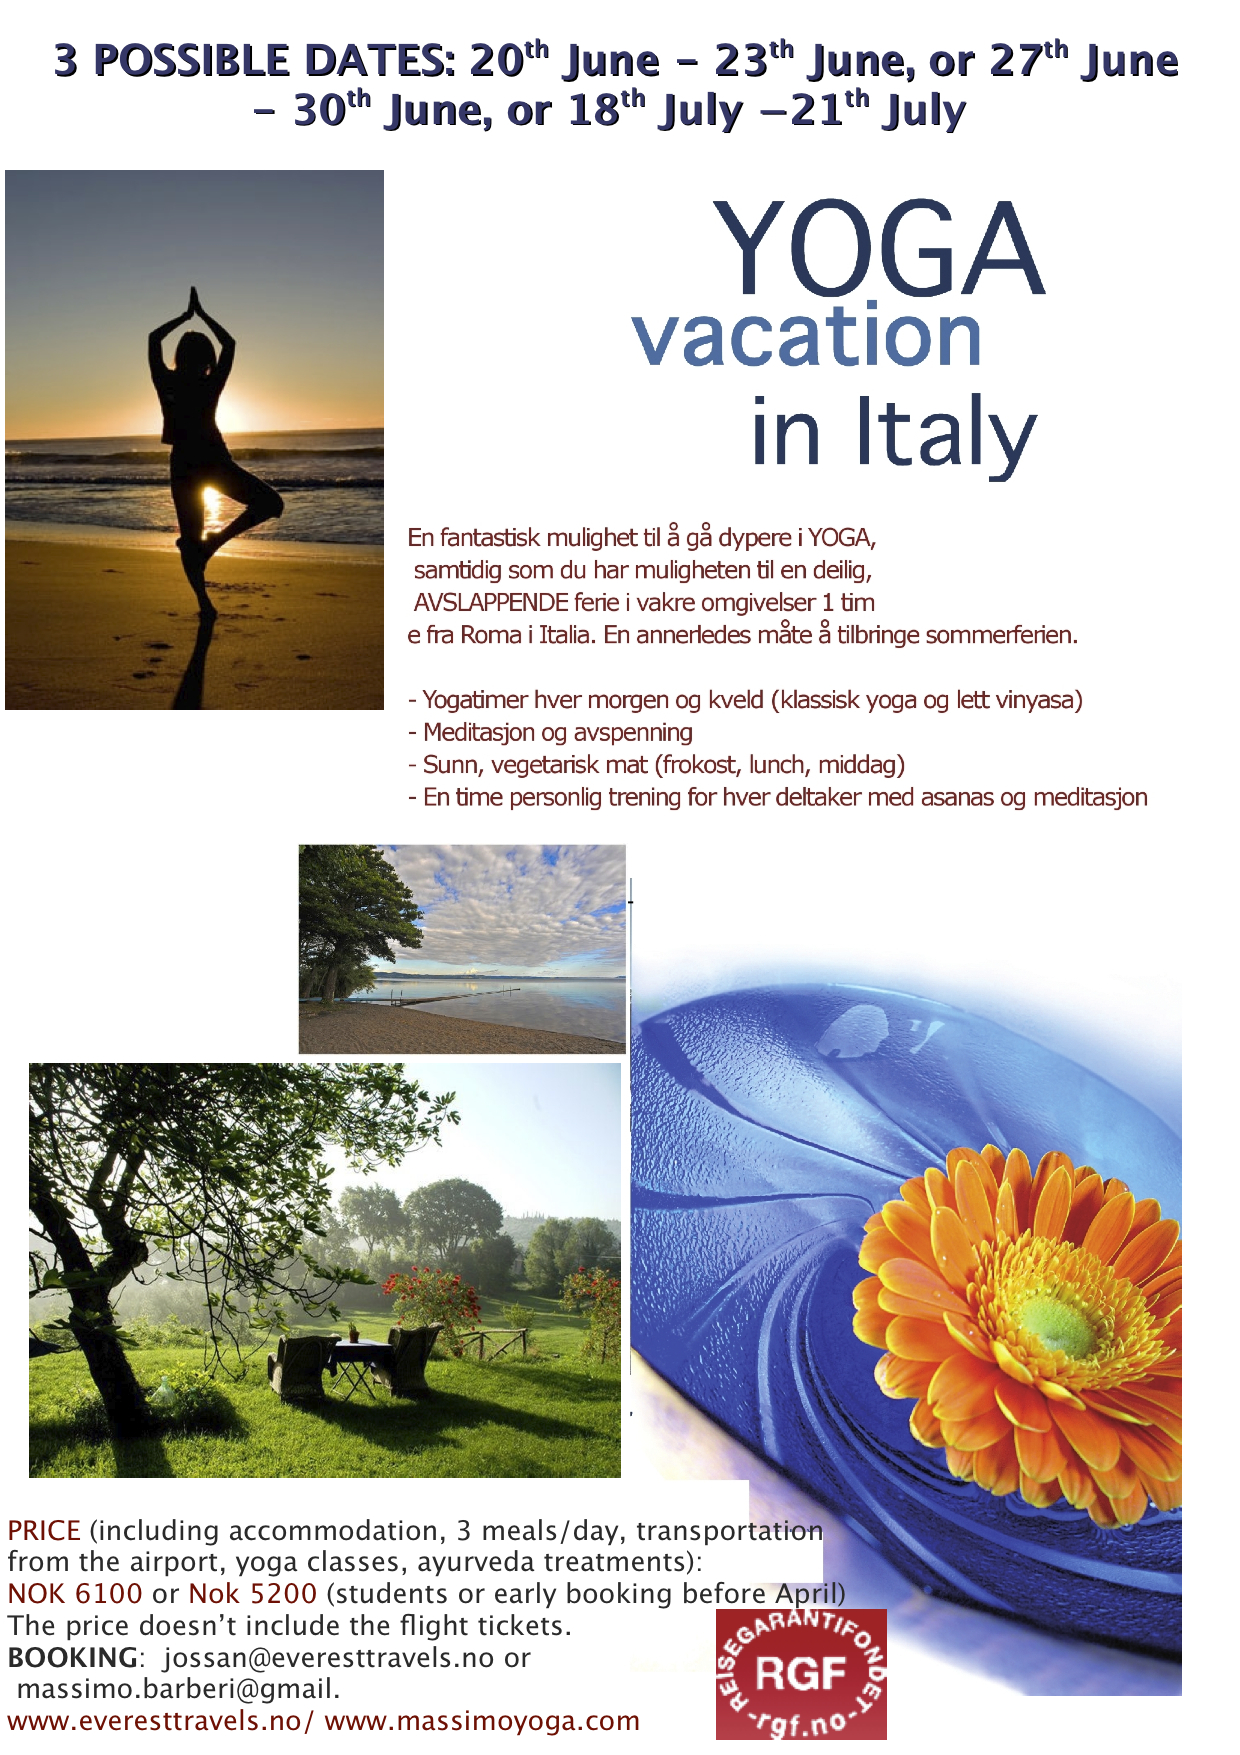 Yoga Vacation Casa Angelica Everest 2014 | MASSIMO YOGA